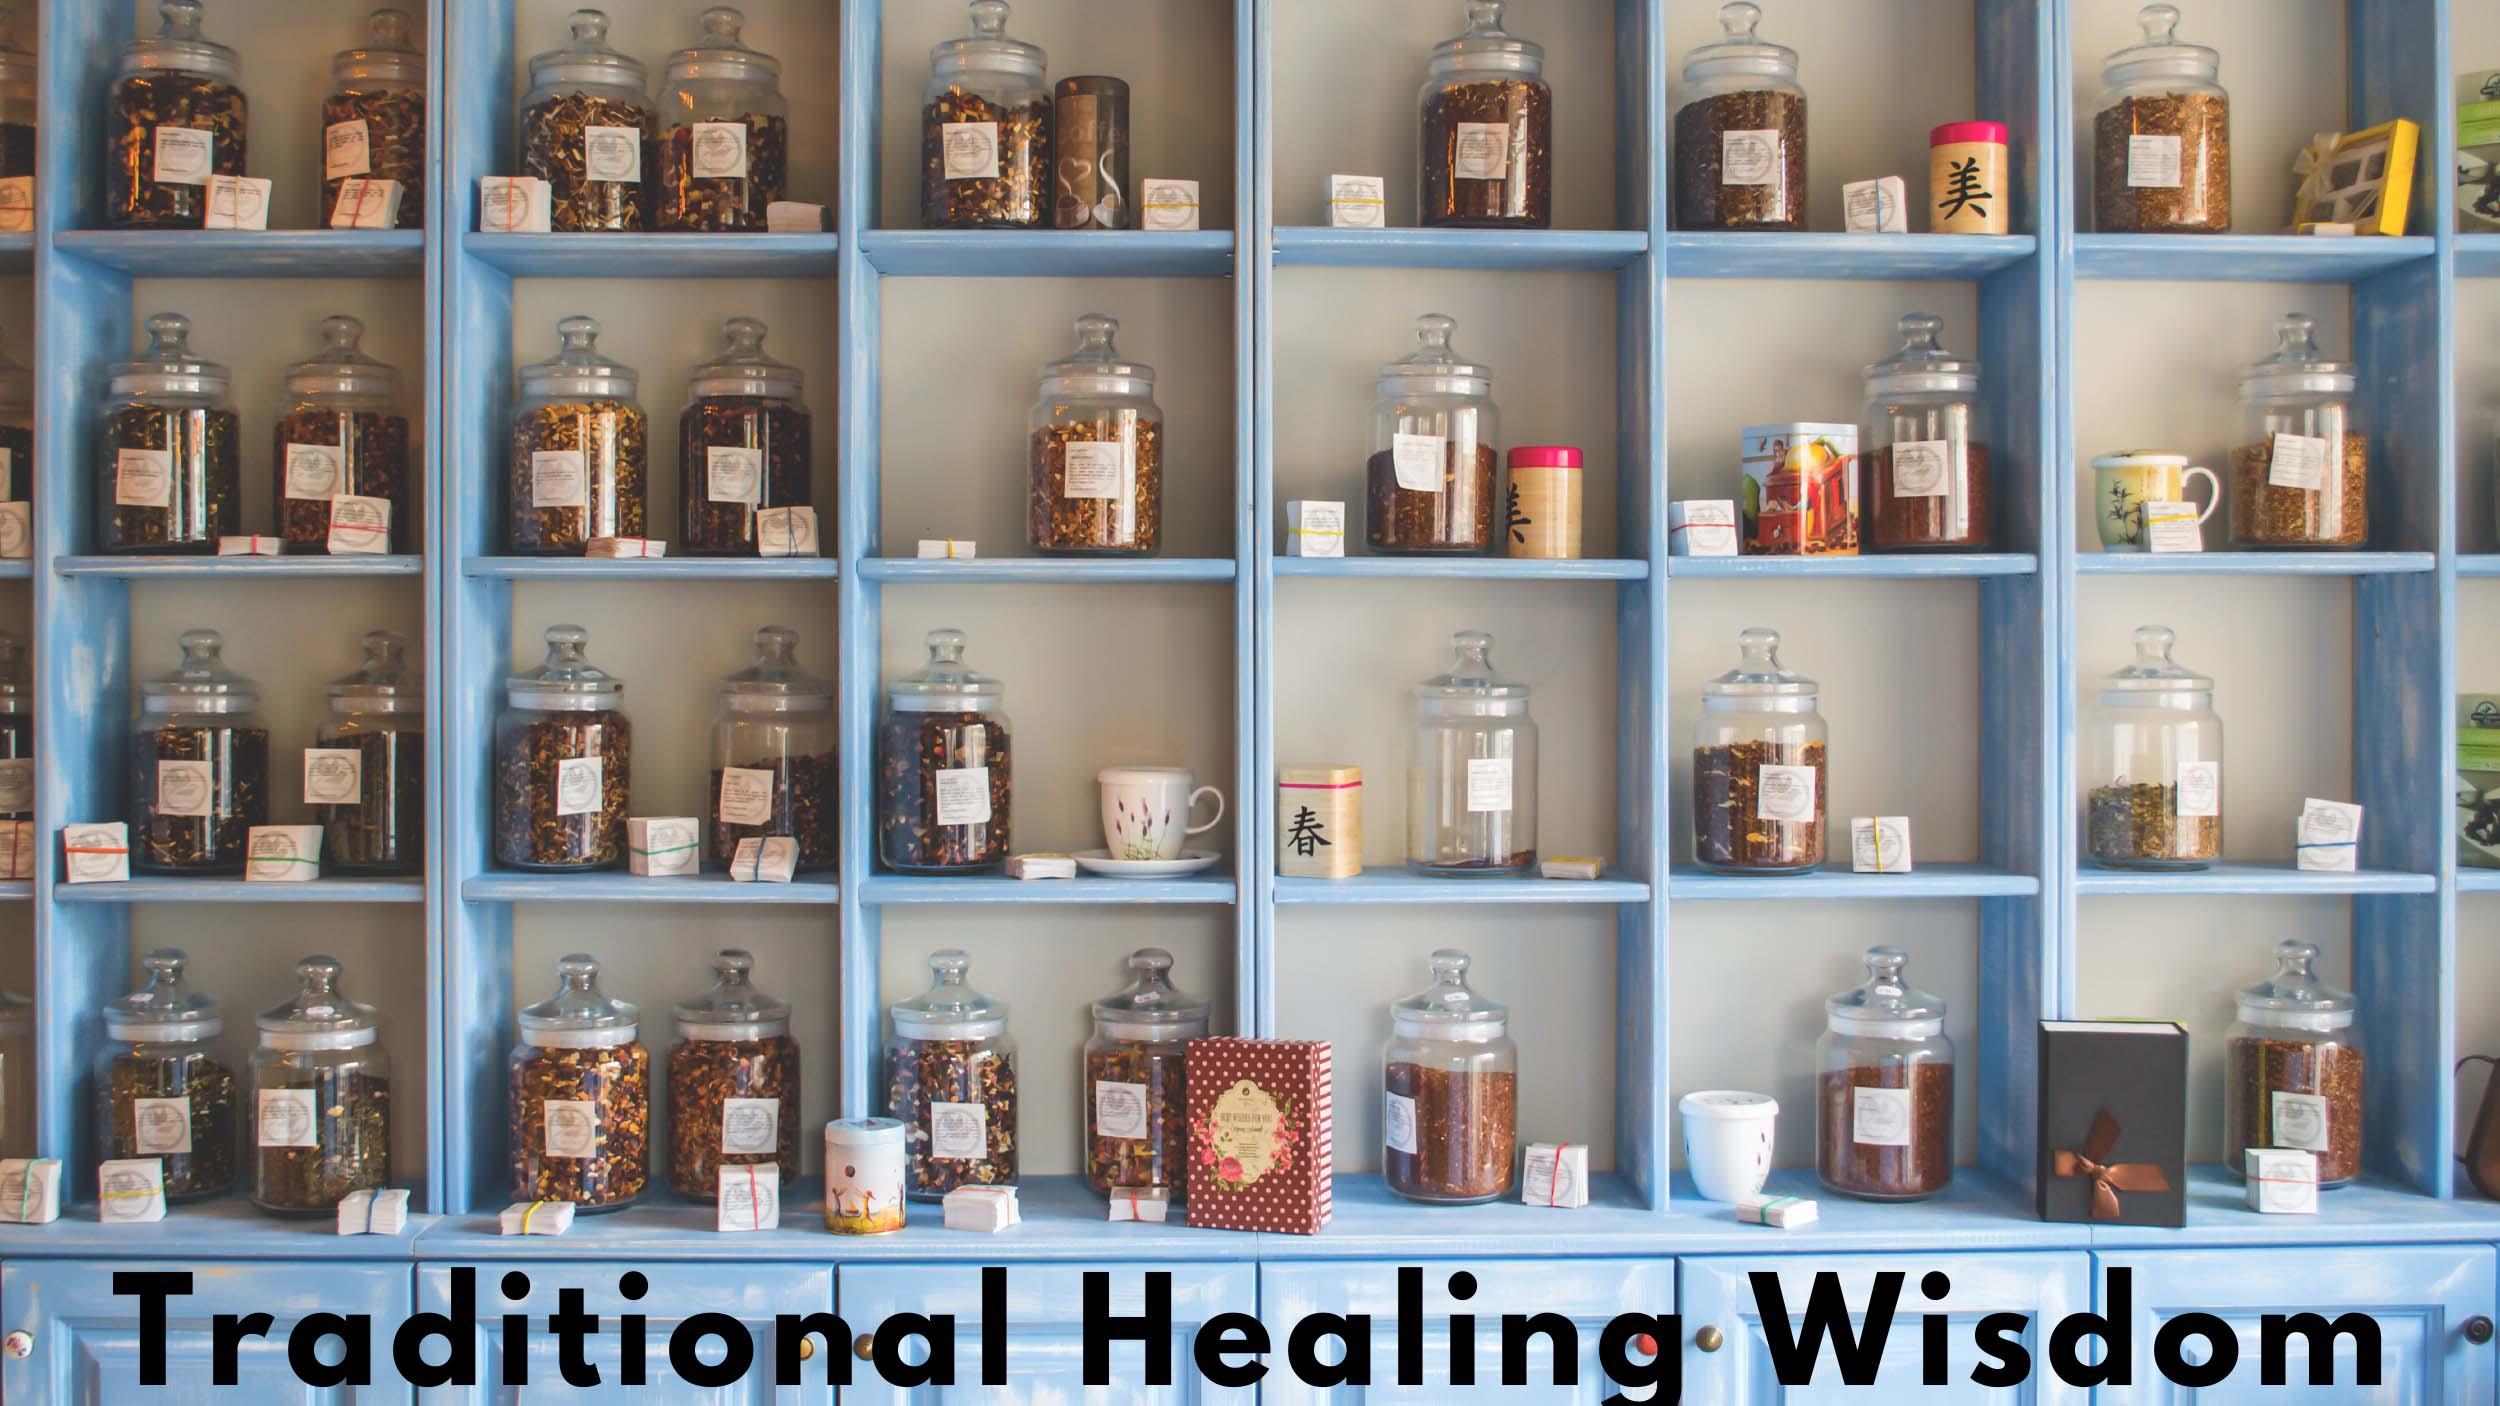 Traditional Healing Wisdom – When is it Appropriate?